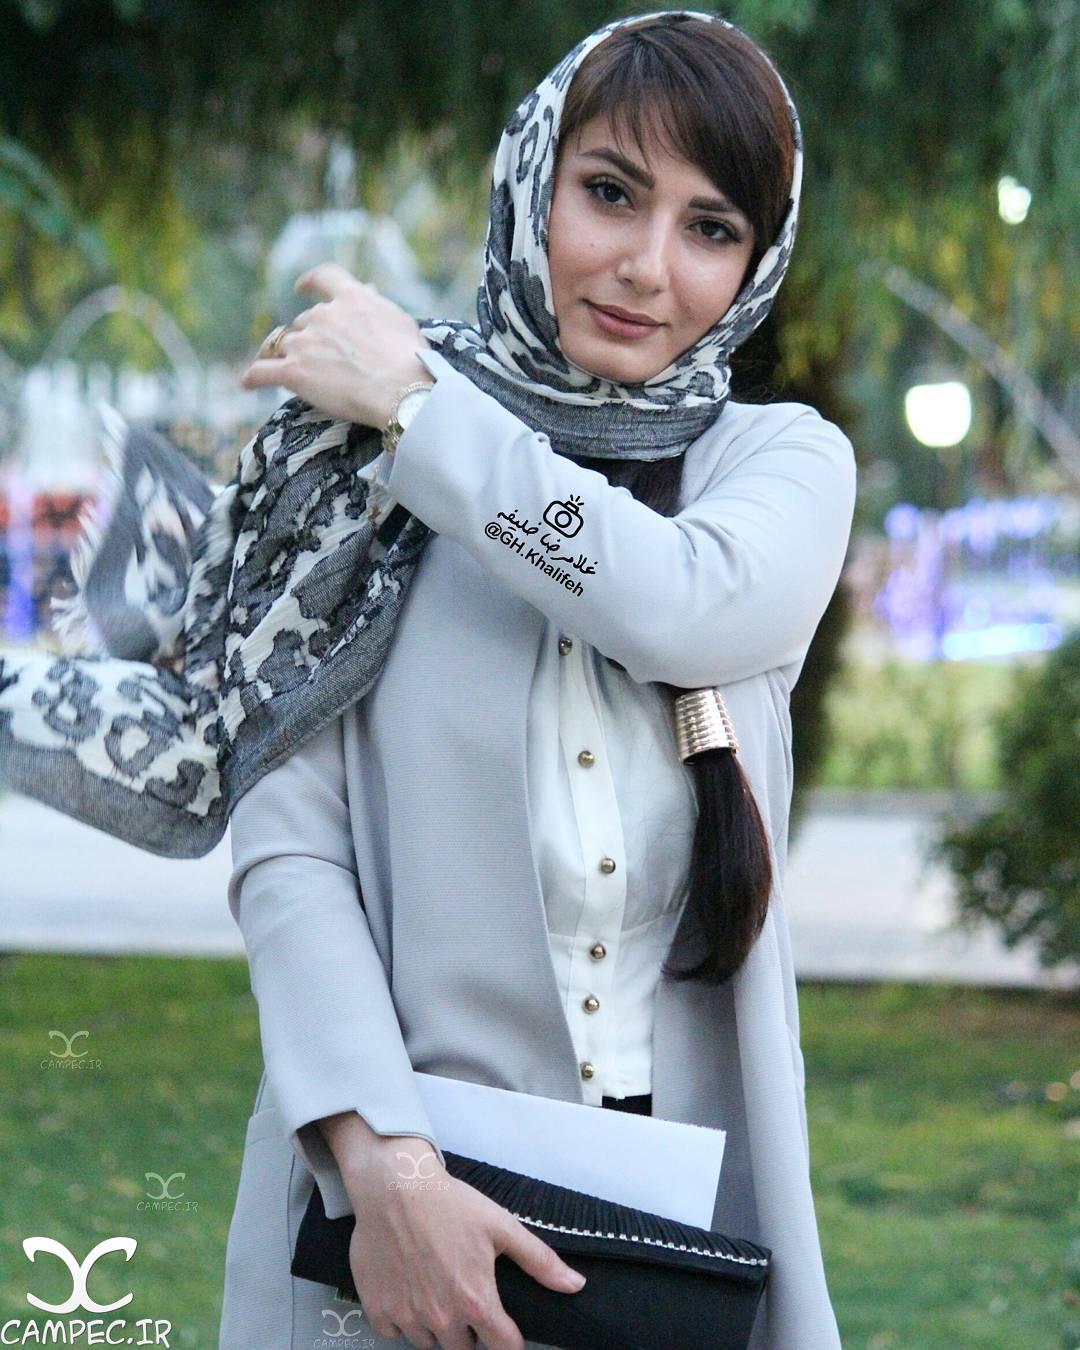 سمیرا حسن پور در جشن حافظ